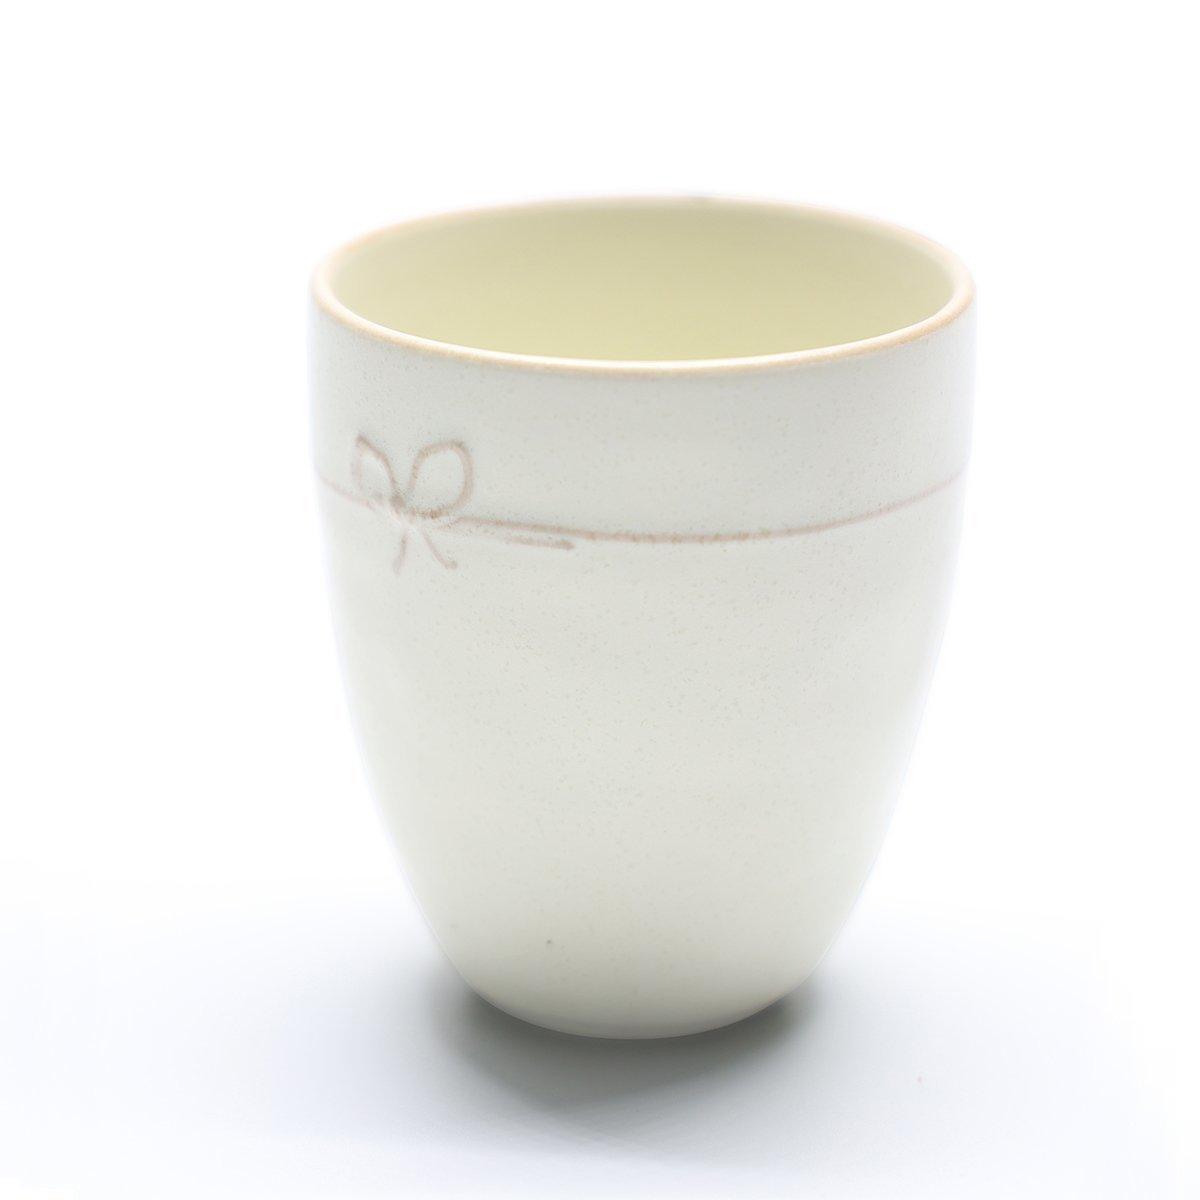 MUSUBI日式美濃焼陶器製造杯